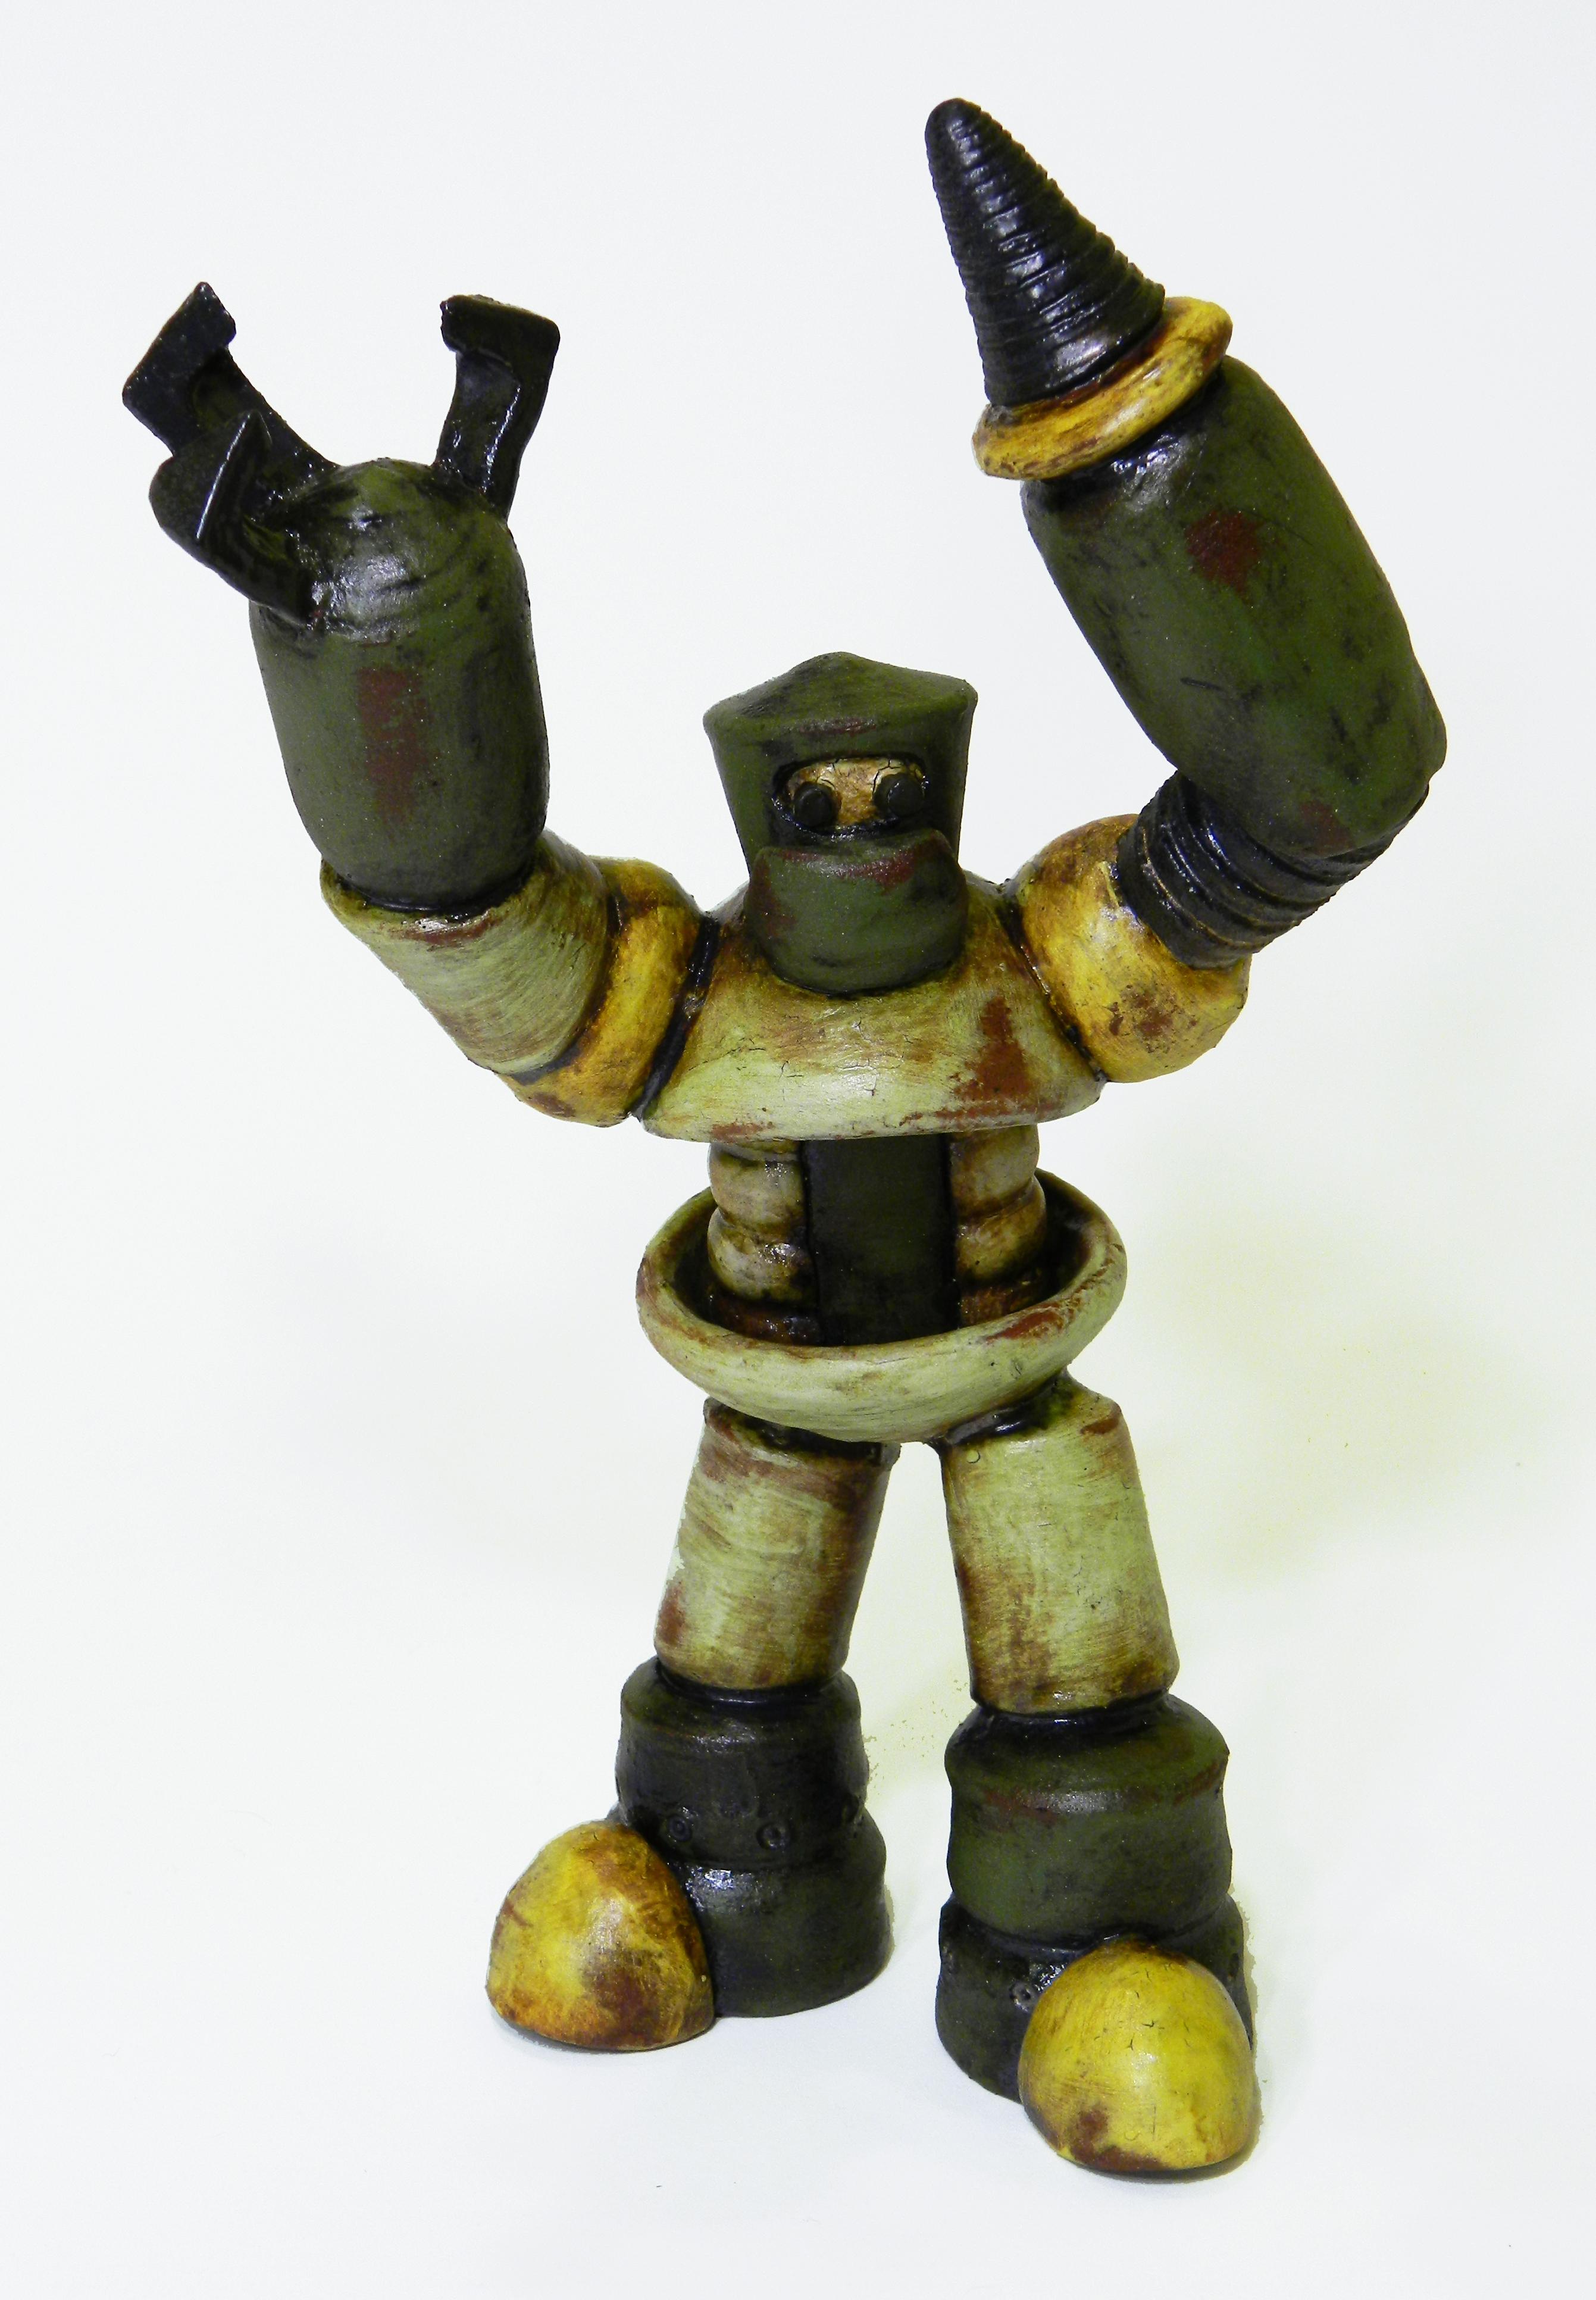 KV-33